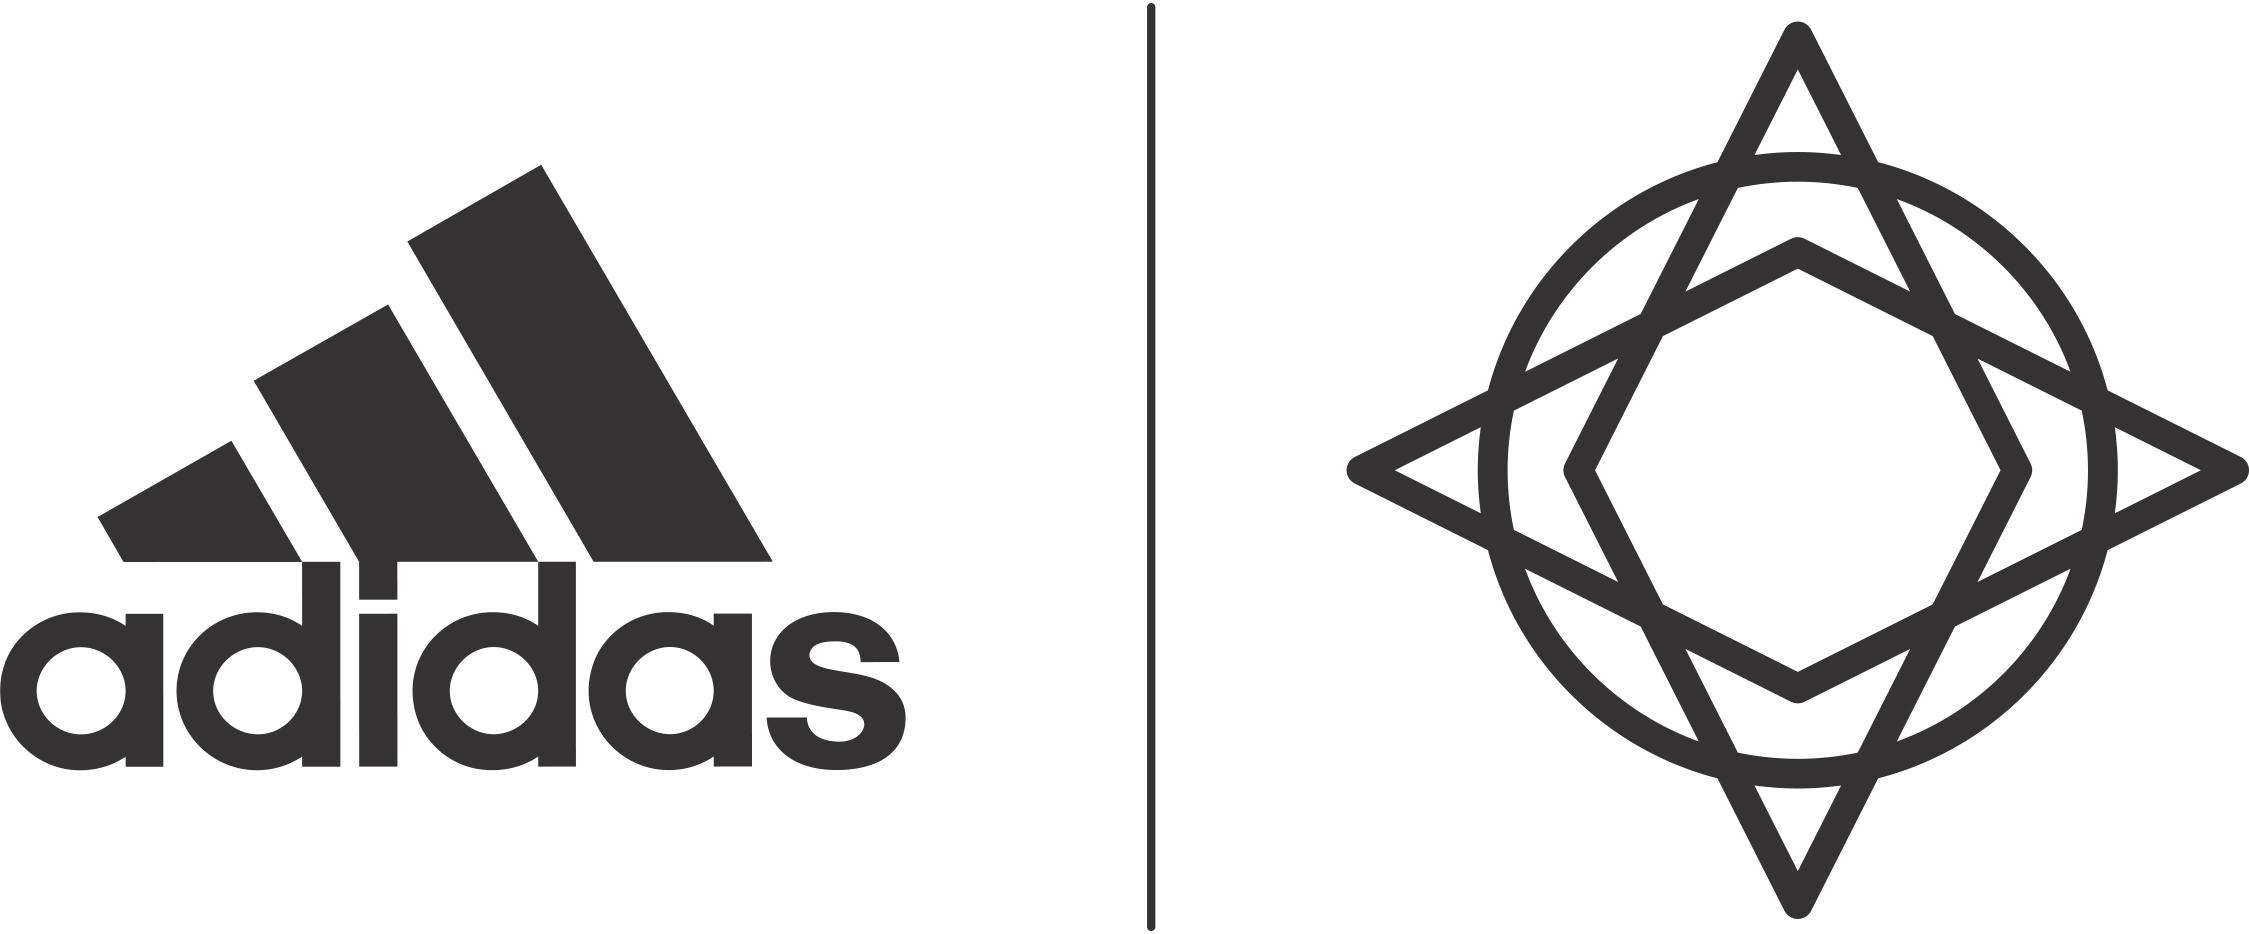 WL+Adidas_Lockup_Icons_Gray_Heavy.jpg